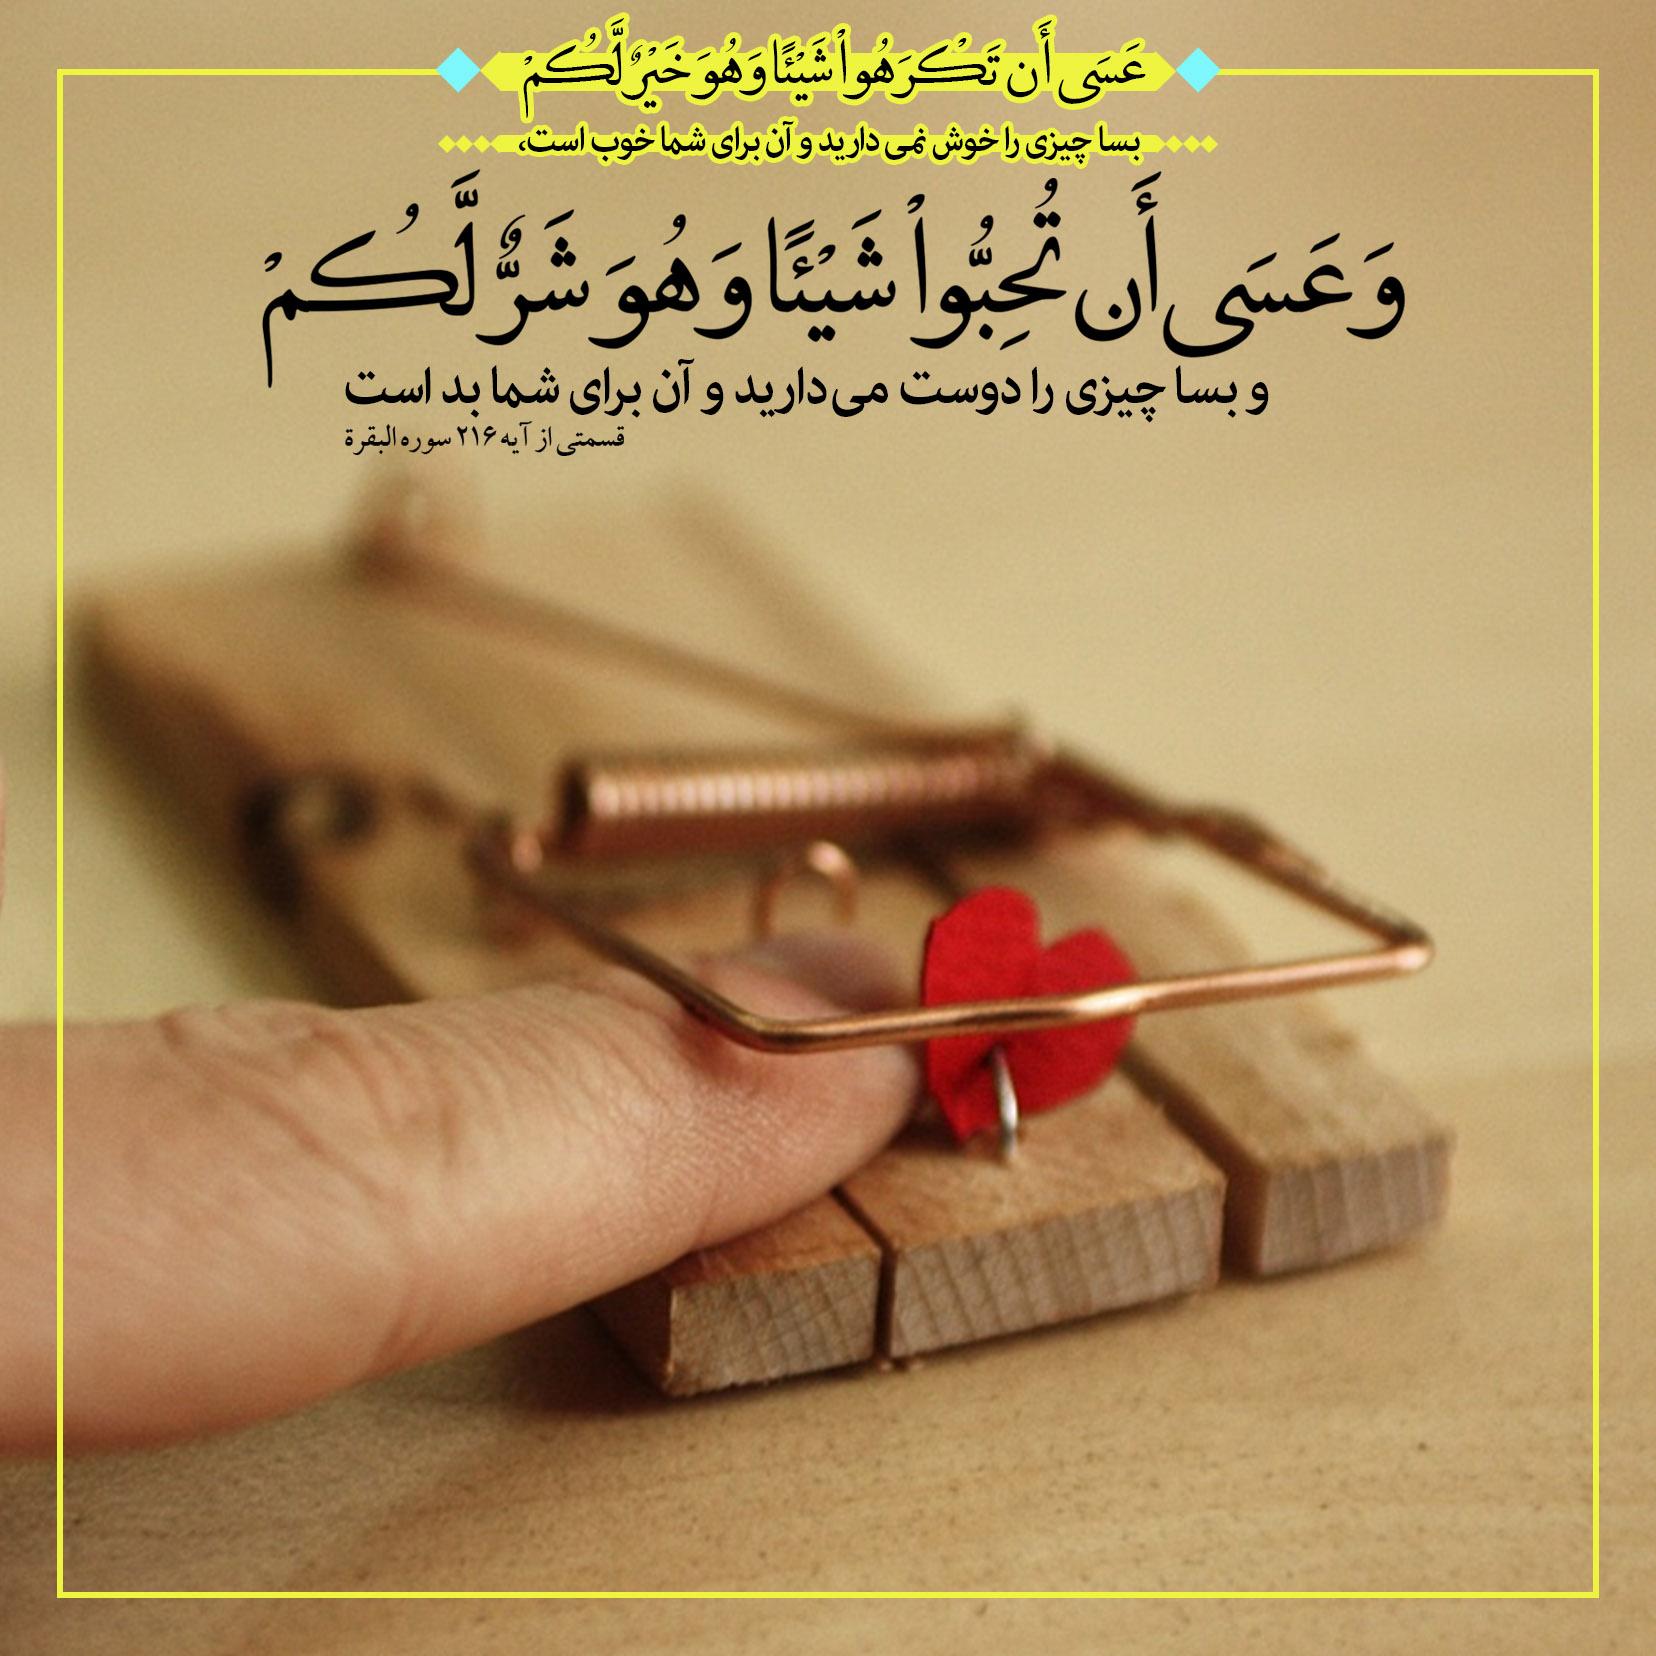 Image result for آیه گرافی دوستی